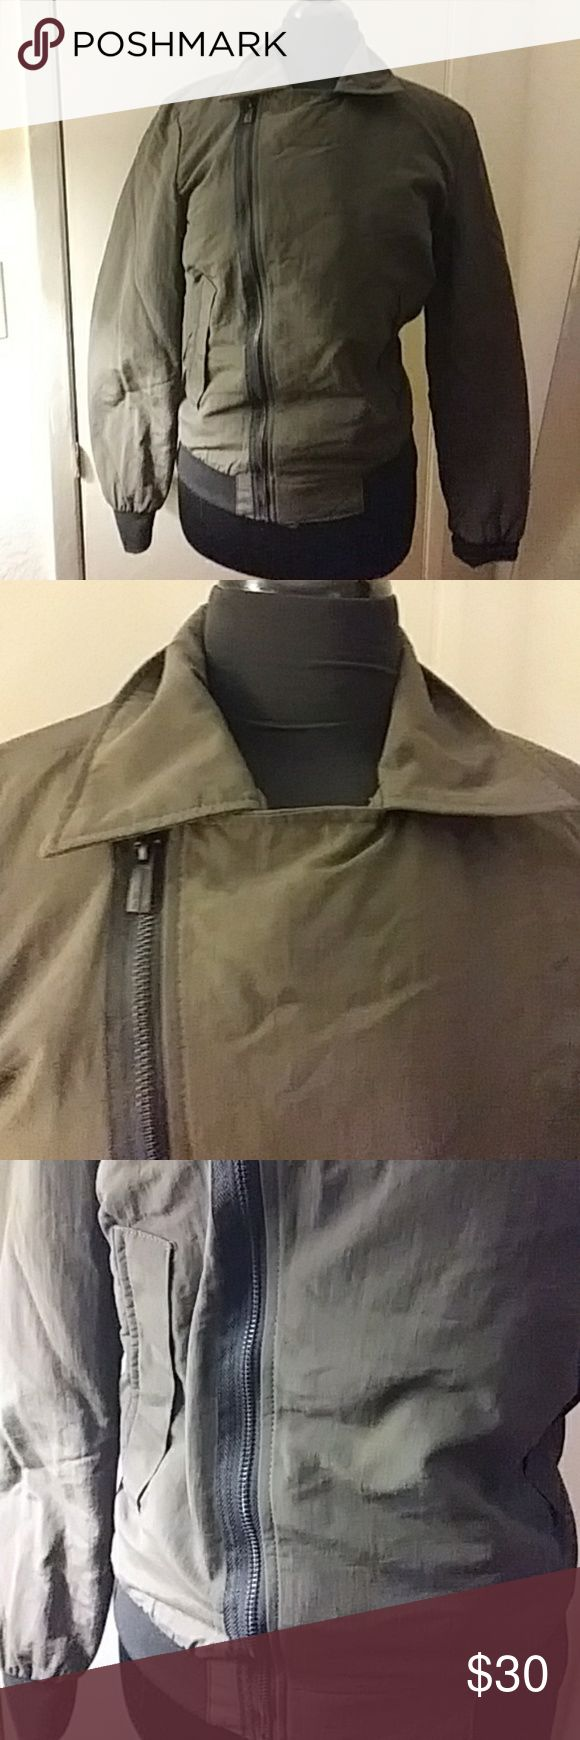 ZARA MAN BASIC Huntwr2 Green* elastic on wrist* elastic waiat2* front zippwr2* front button pockets * inner linnig * Zara Jackets & Coats